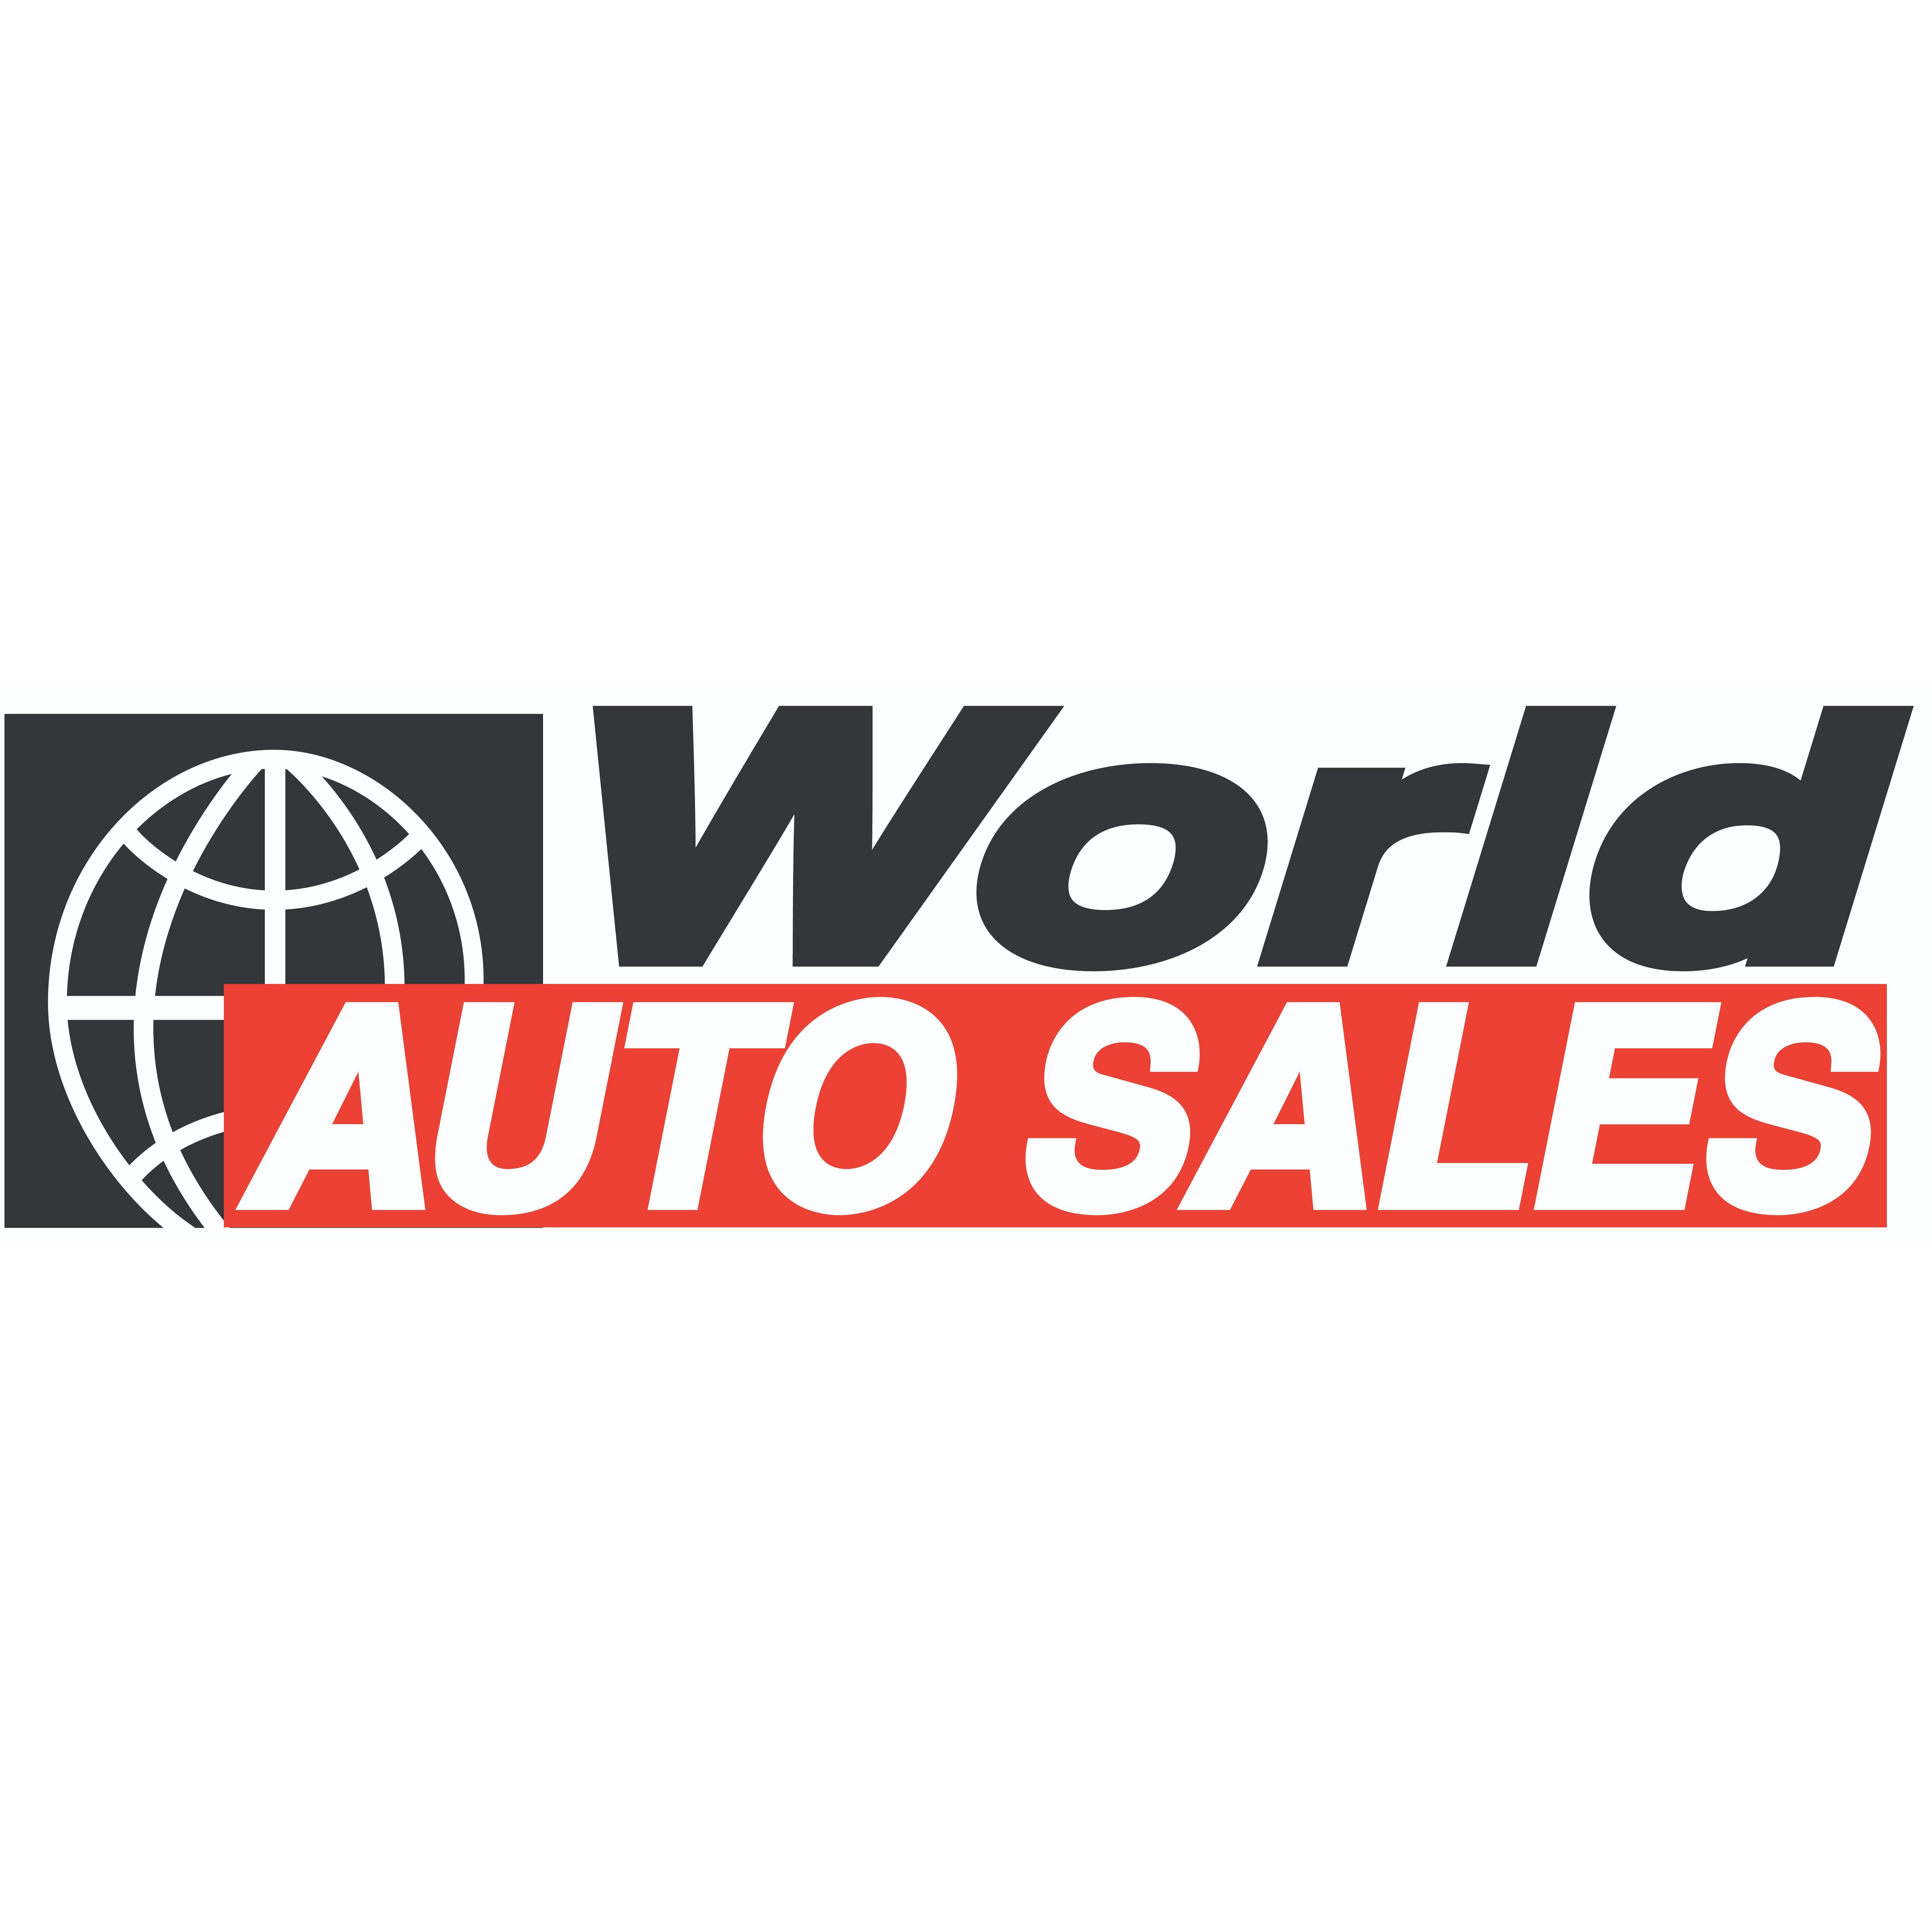 World Auto Sales image 9